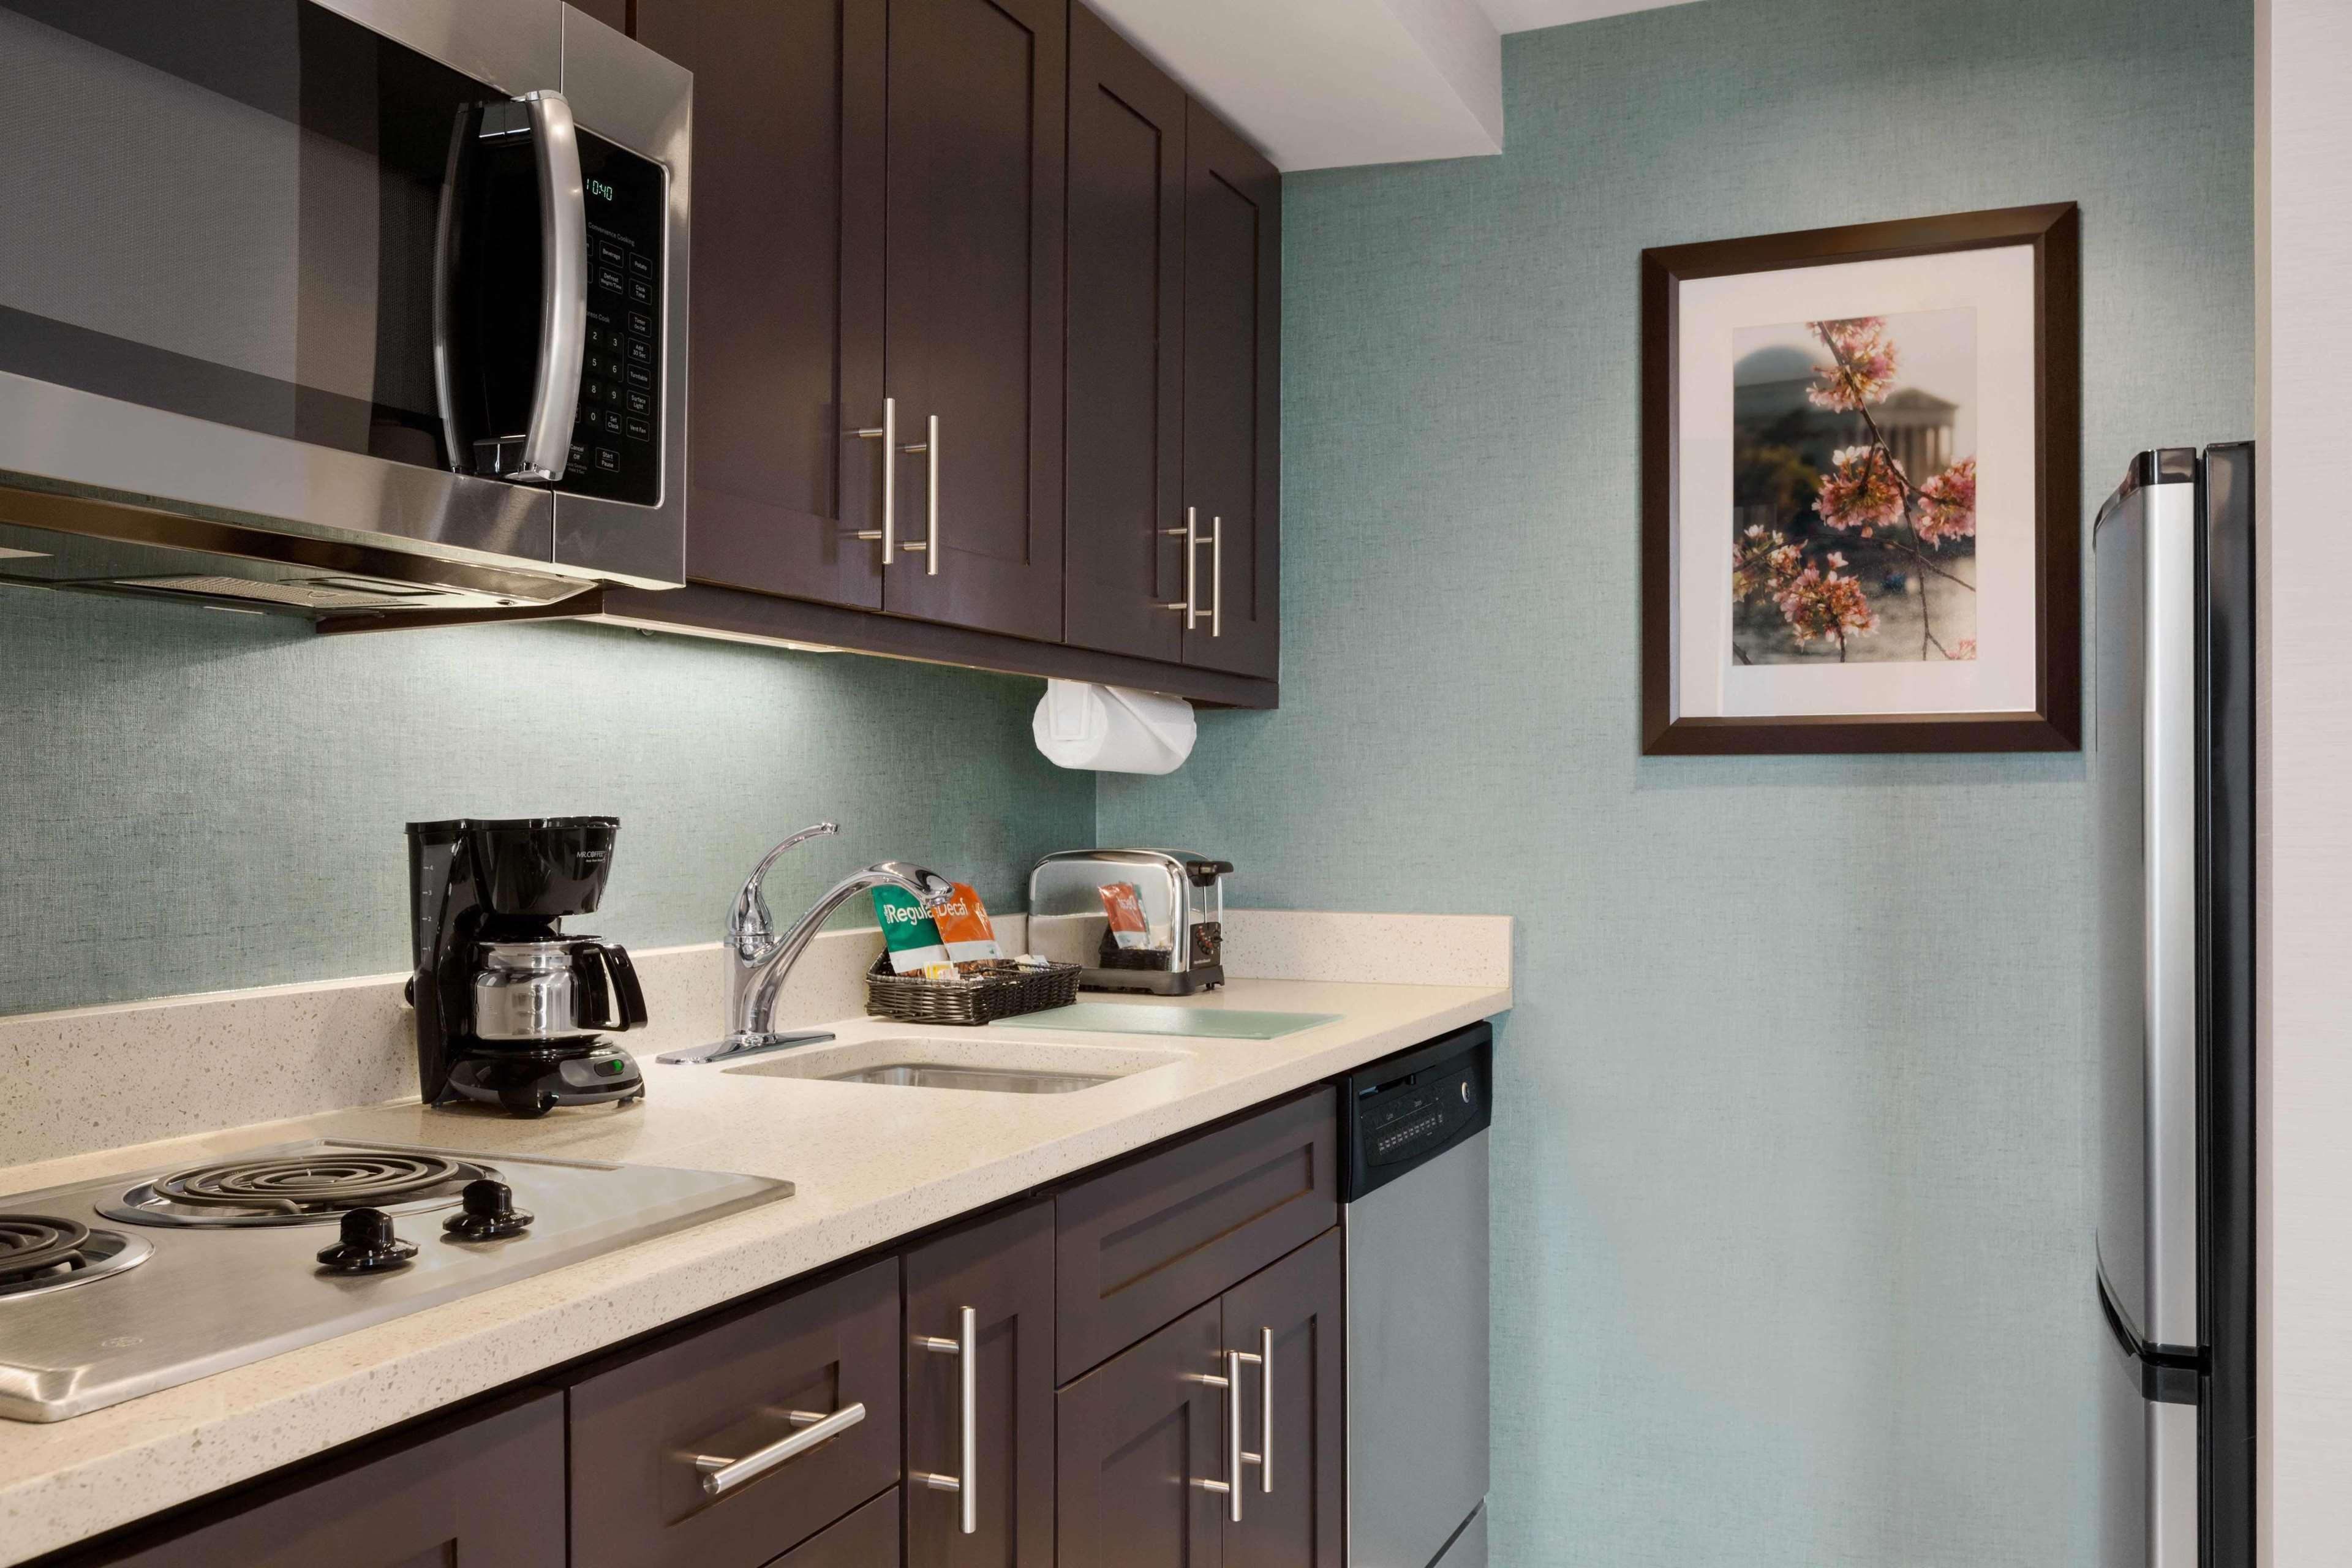 Homewood Suites by Hilton Washington DC Convention Center image 17